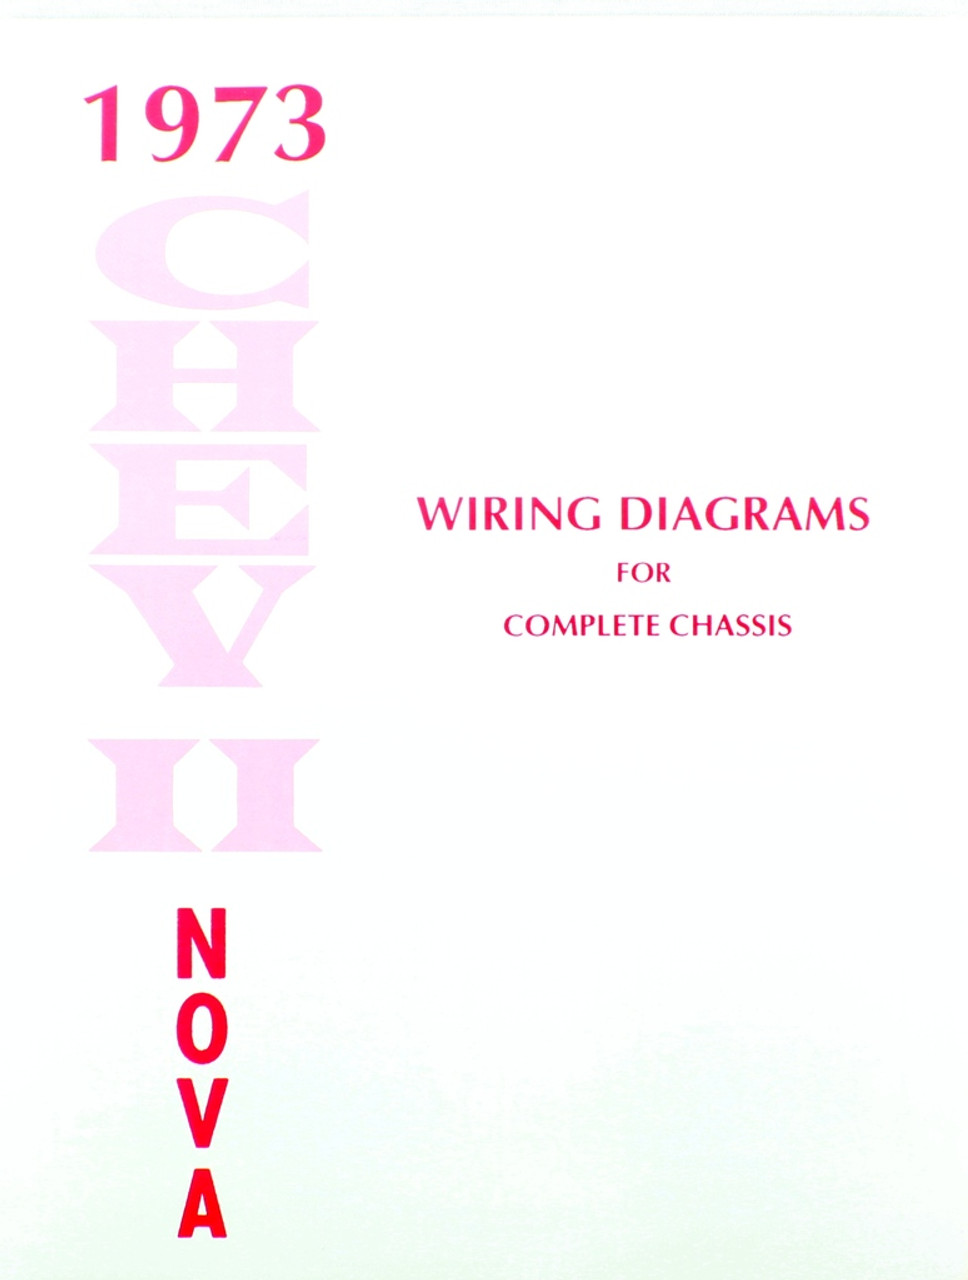 73 Chevy Nova Electrical Wiring Diagram Manual 1973 I 5 Classic